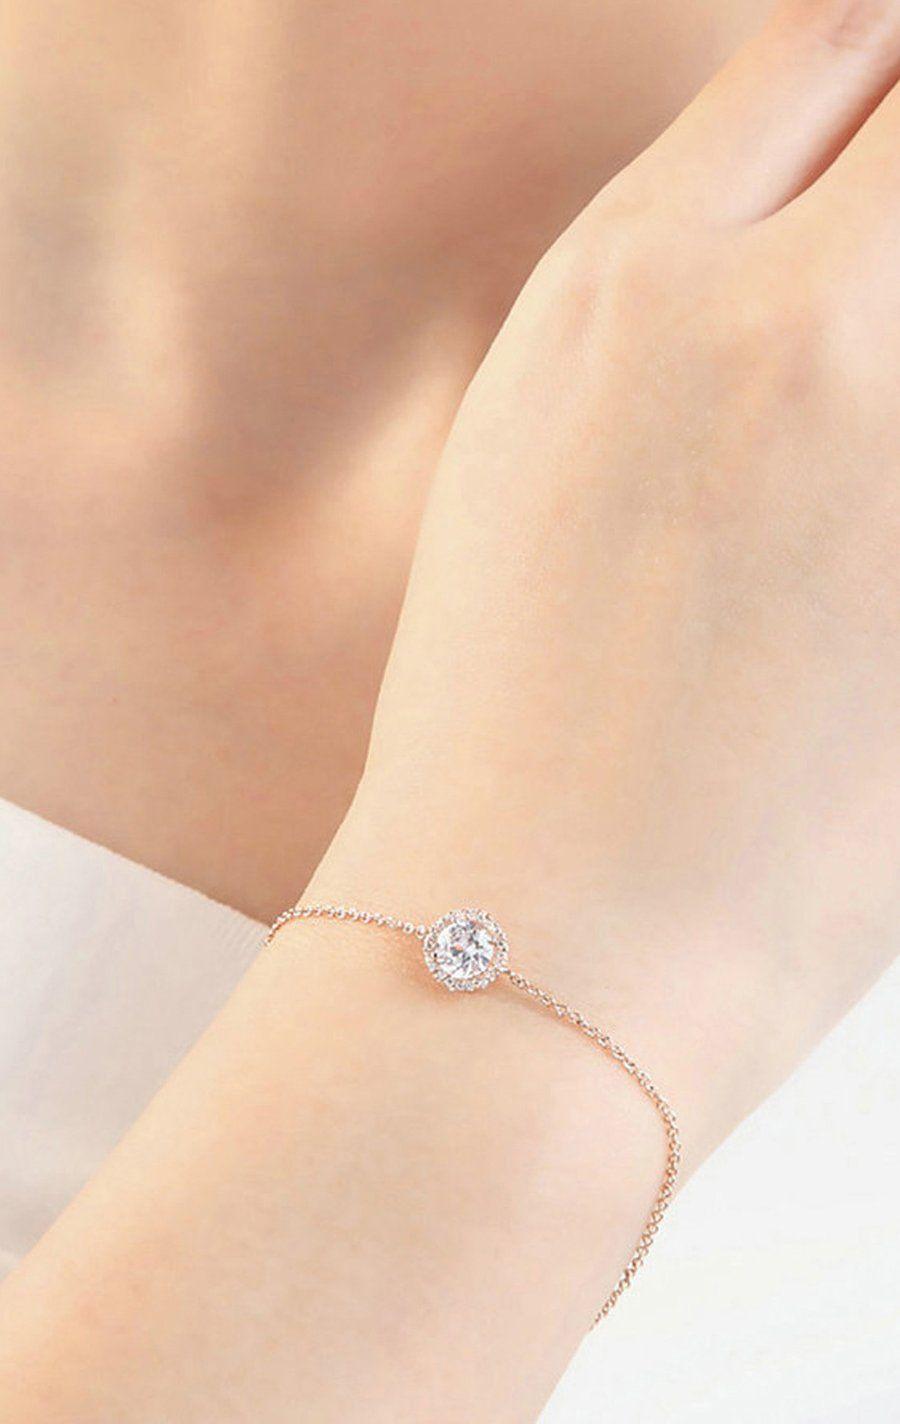 Jessica simple dainty halo crystal chain bracelet